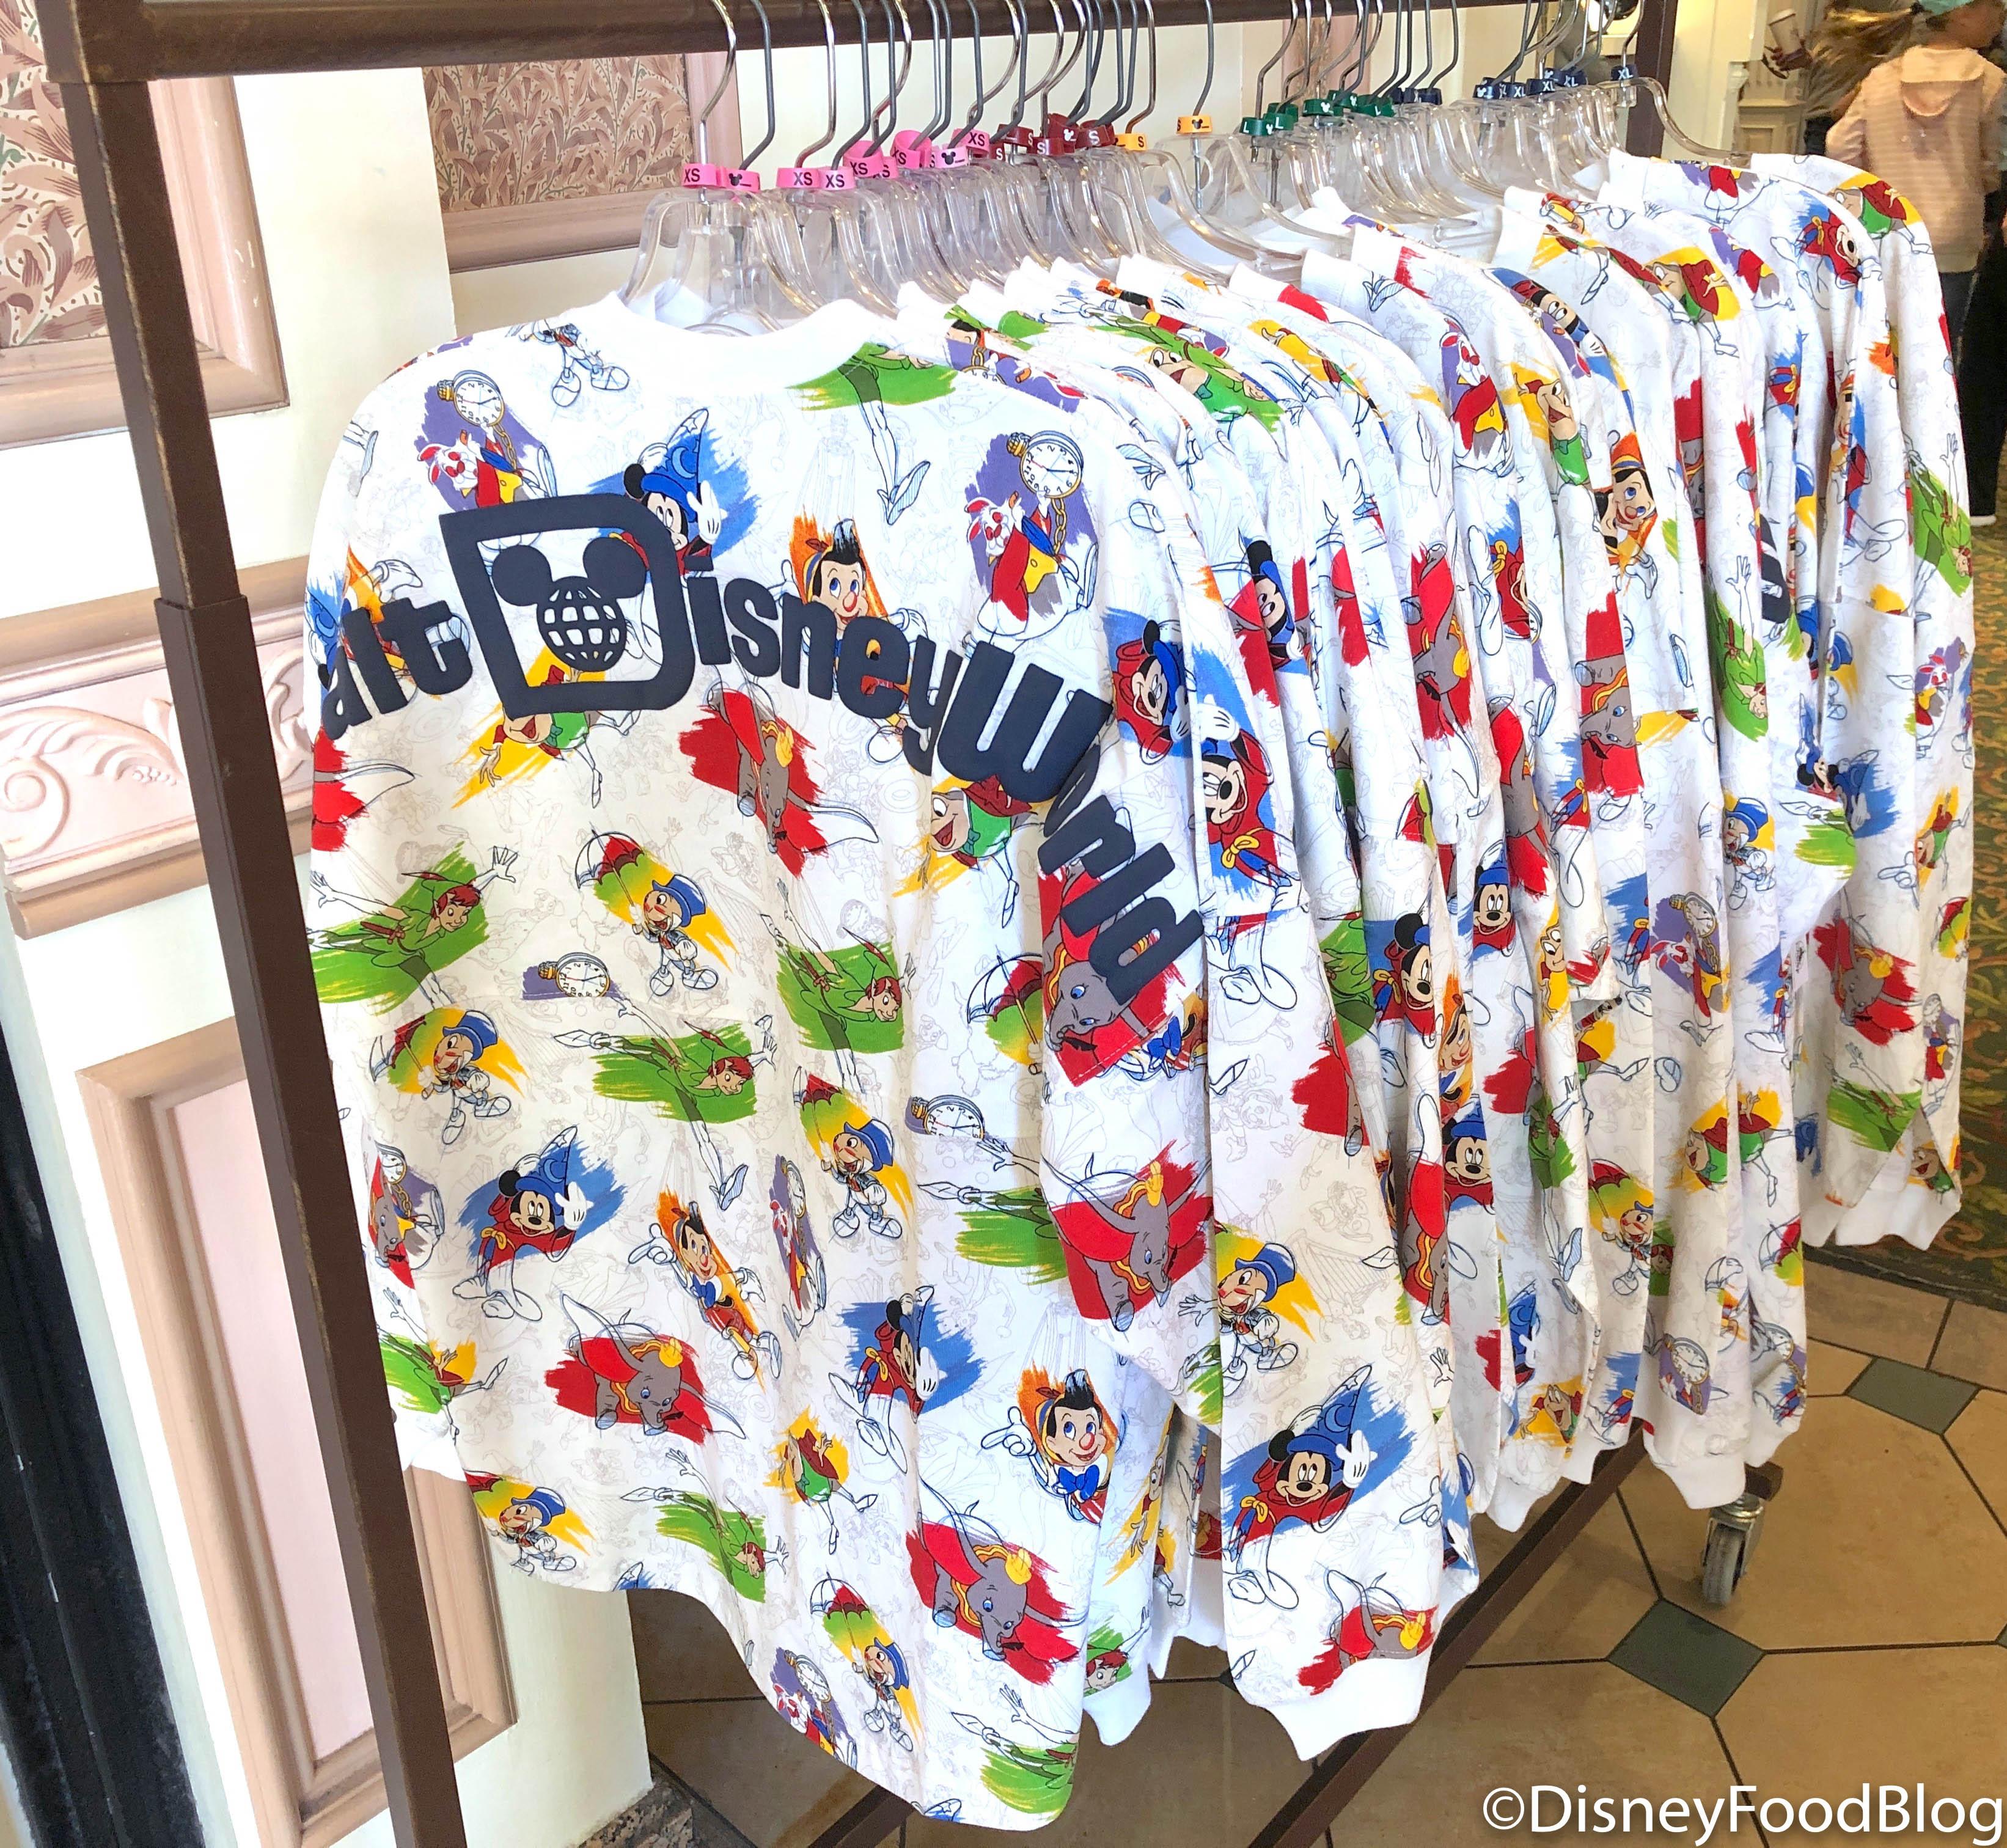 Disney World Christmas Red Sprinkles Treat Spirit Jersey Shirt XS In Hand